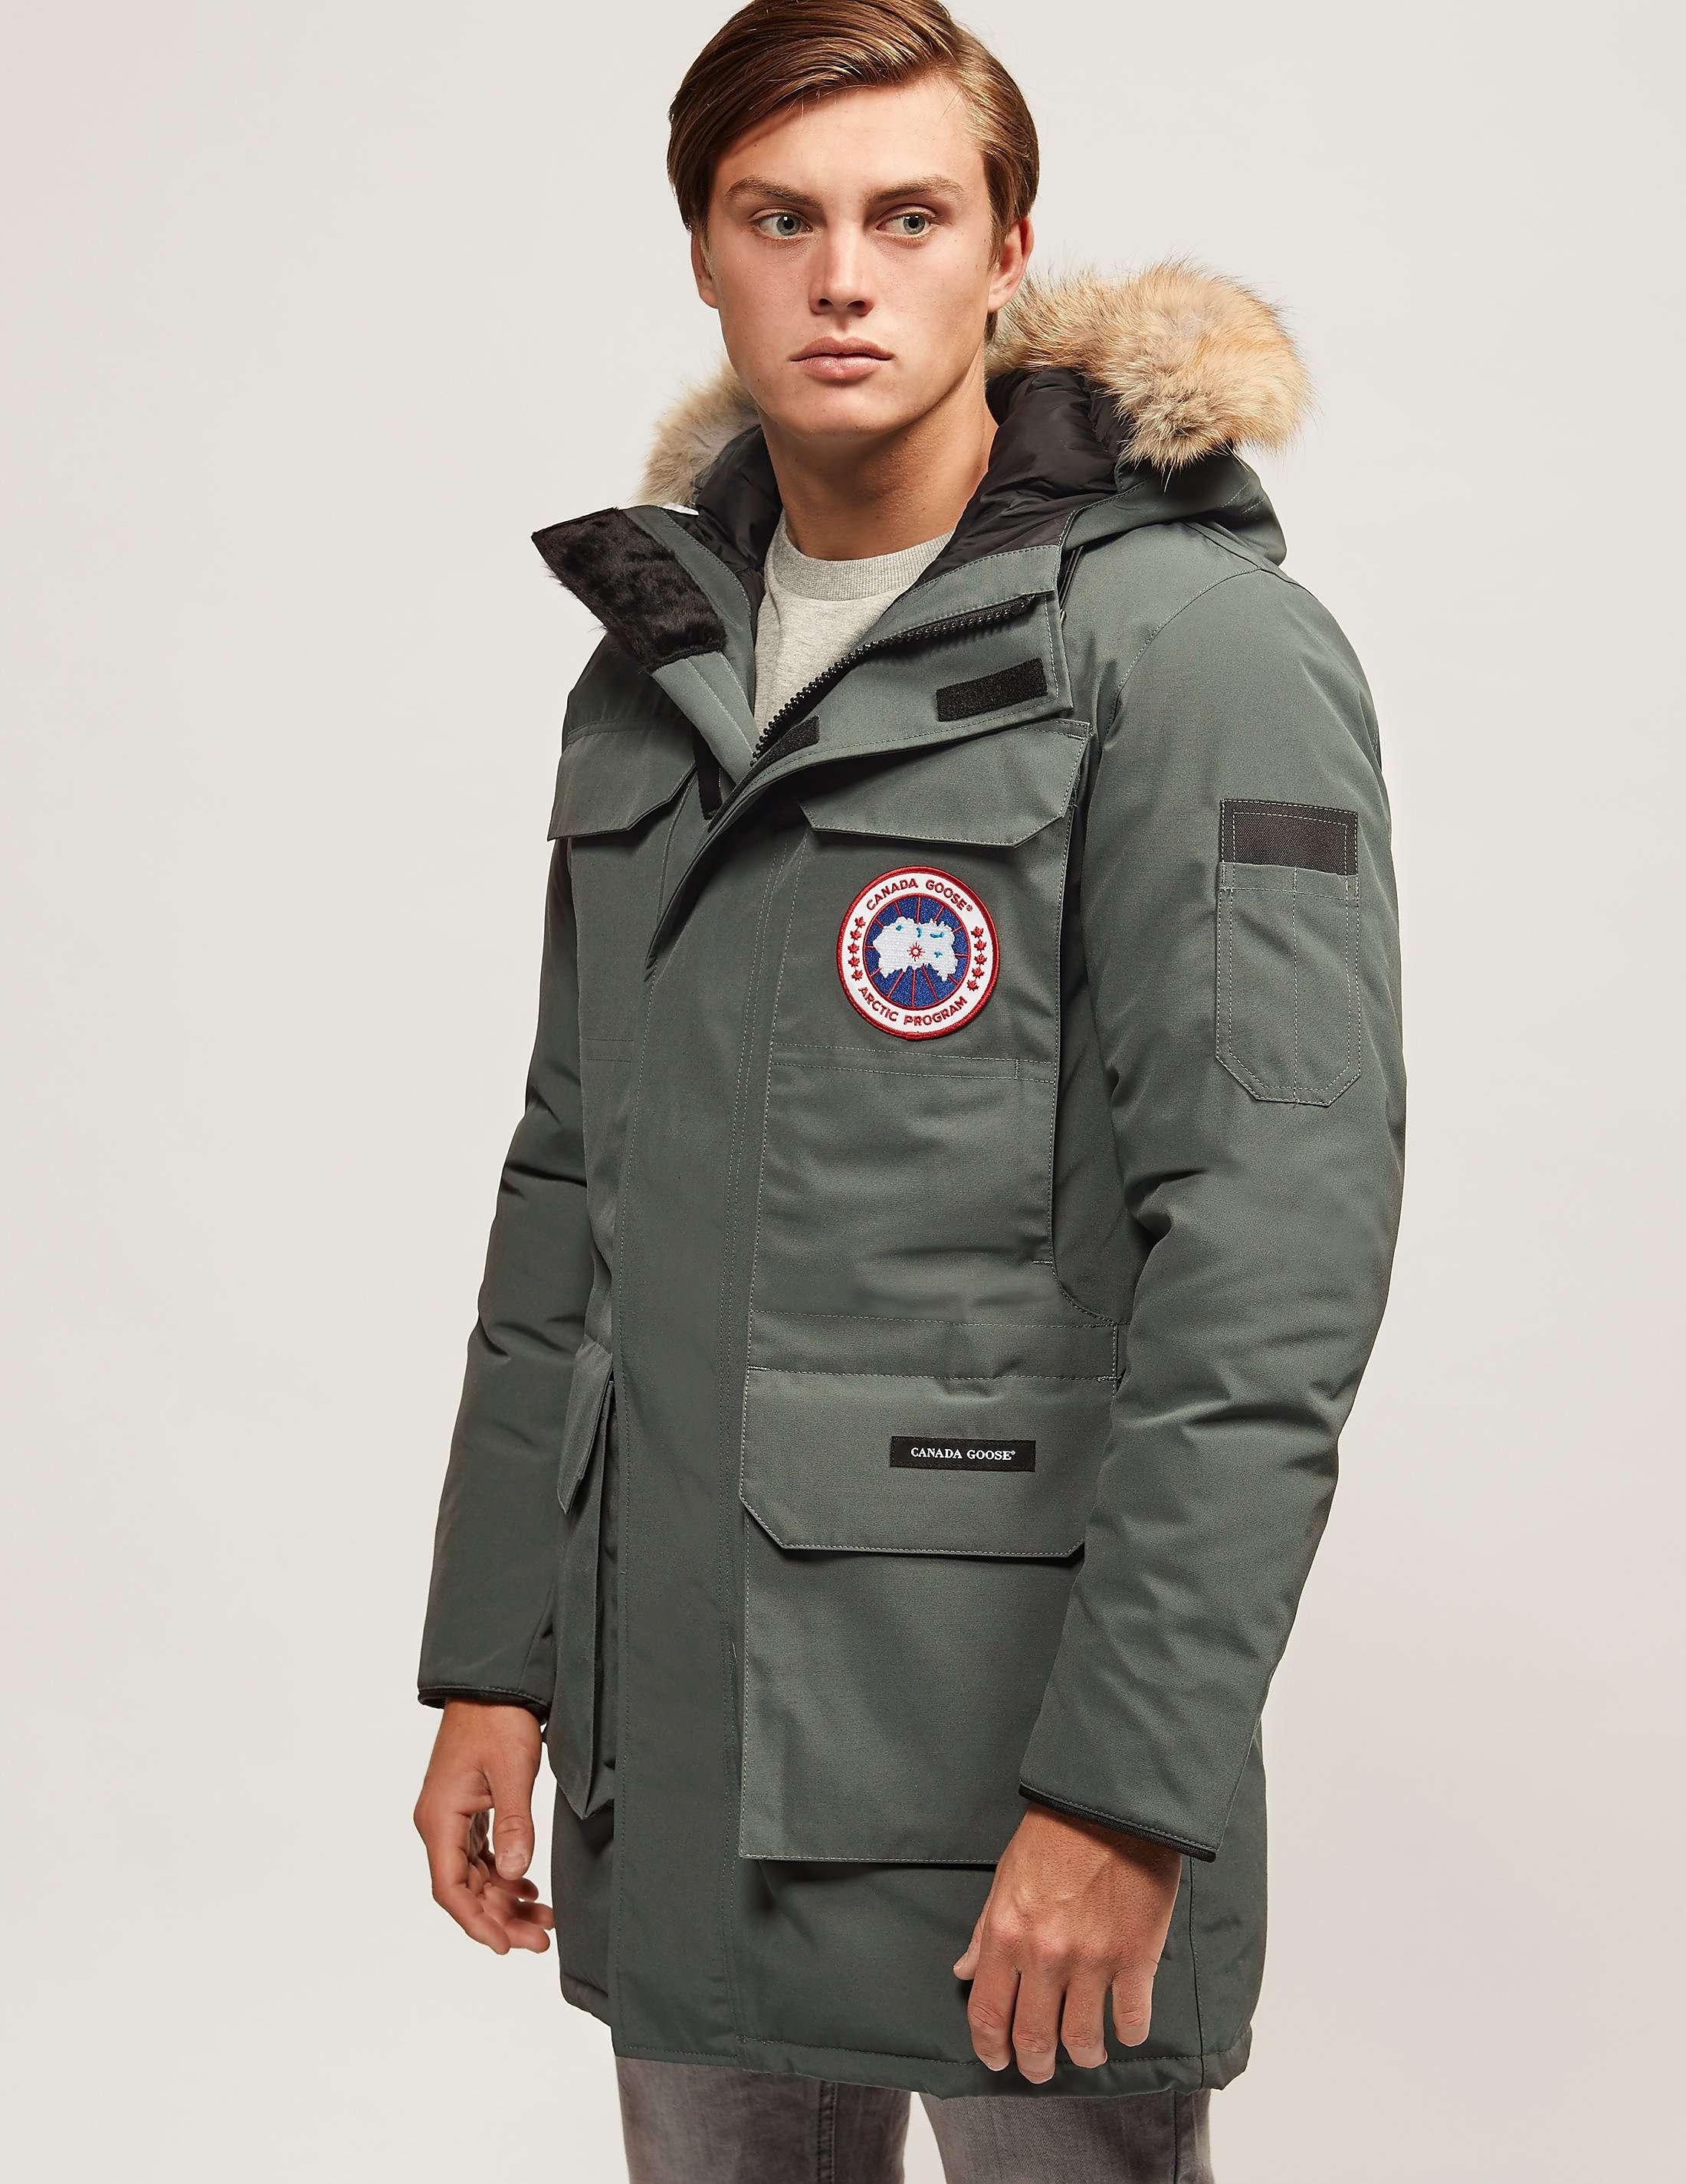 Canada Goose Coat Mens